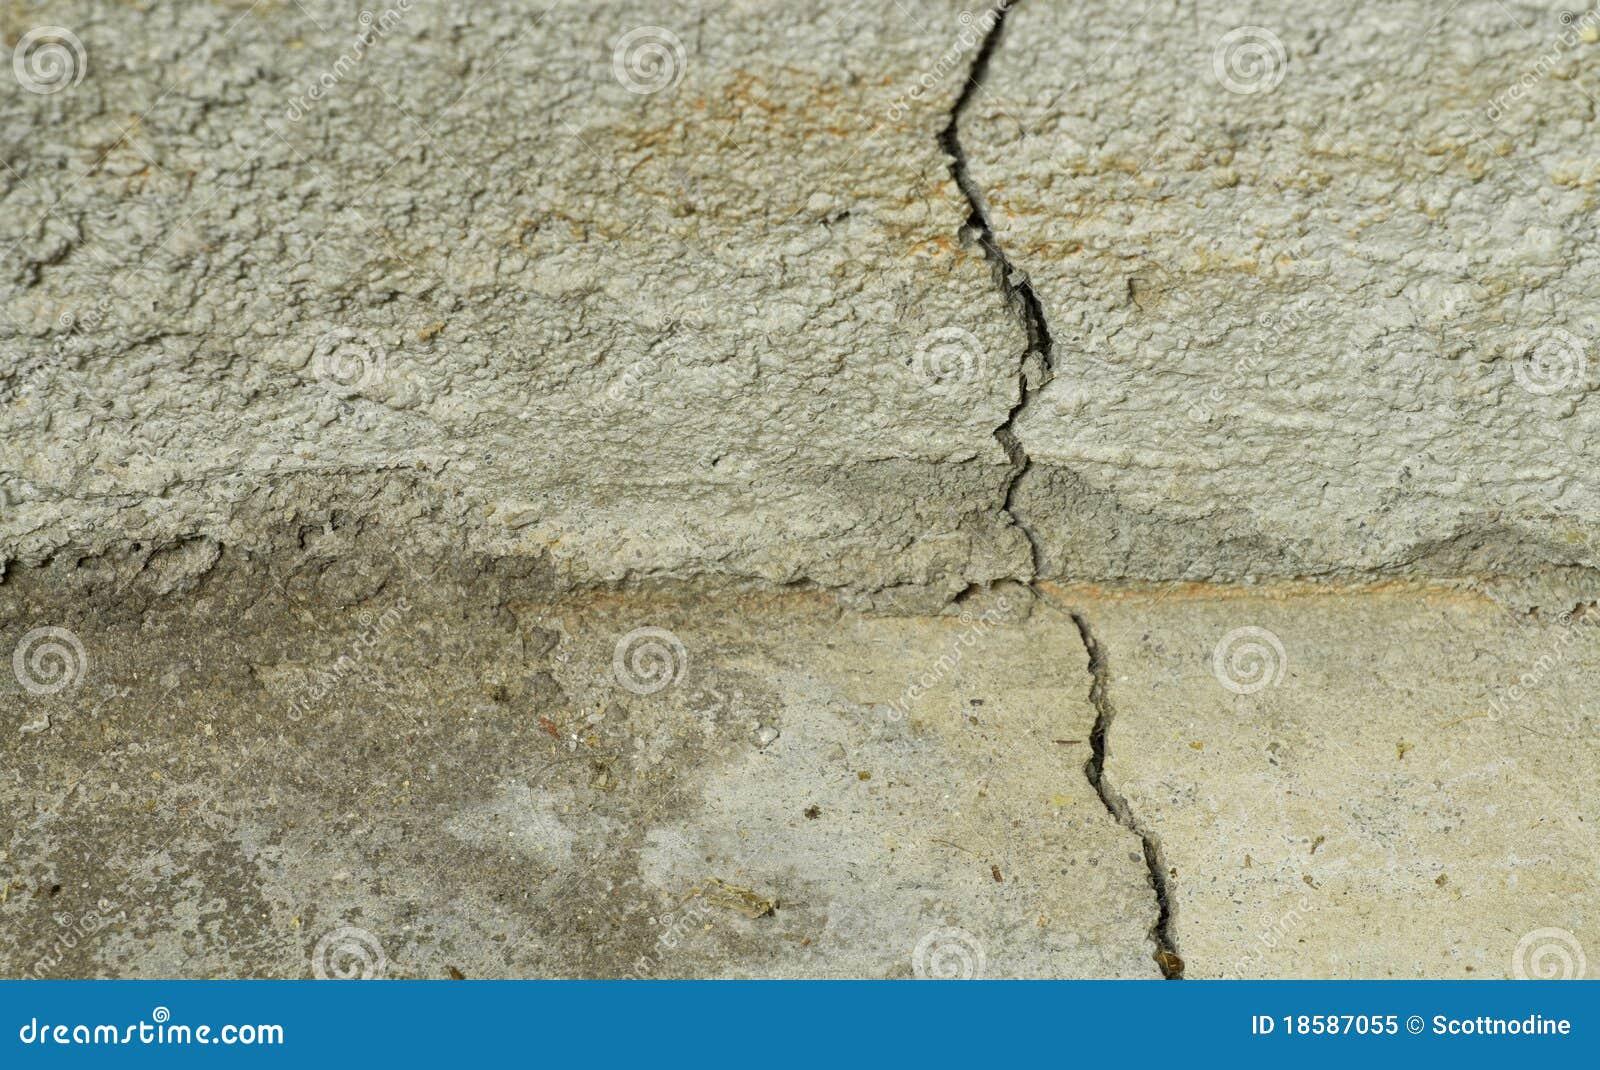 Crack In The Foundation Floor Roimcelp